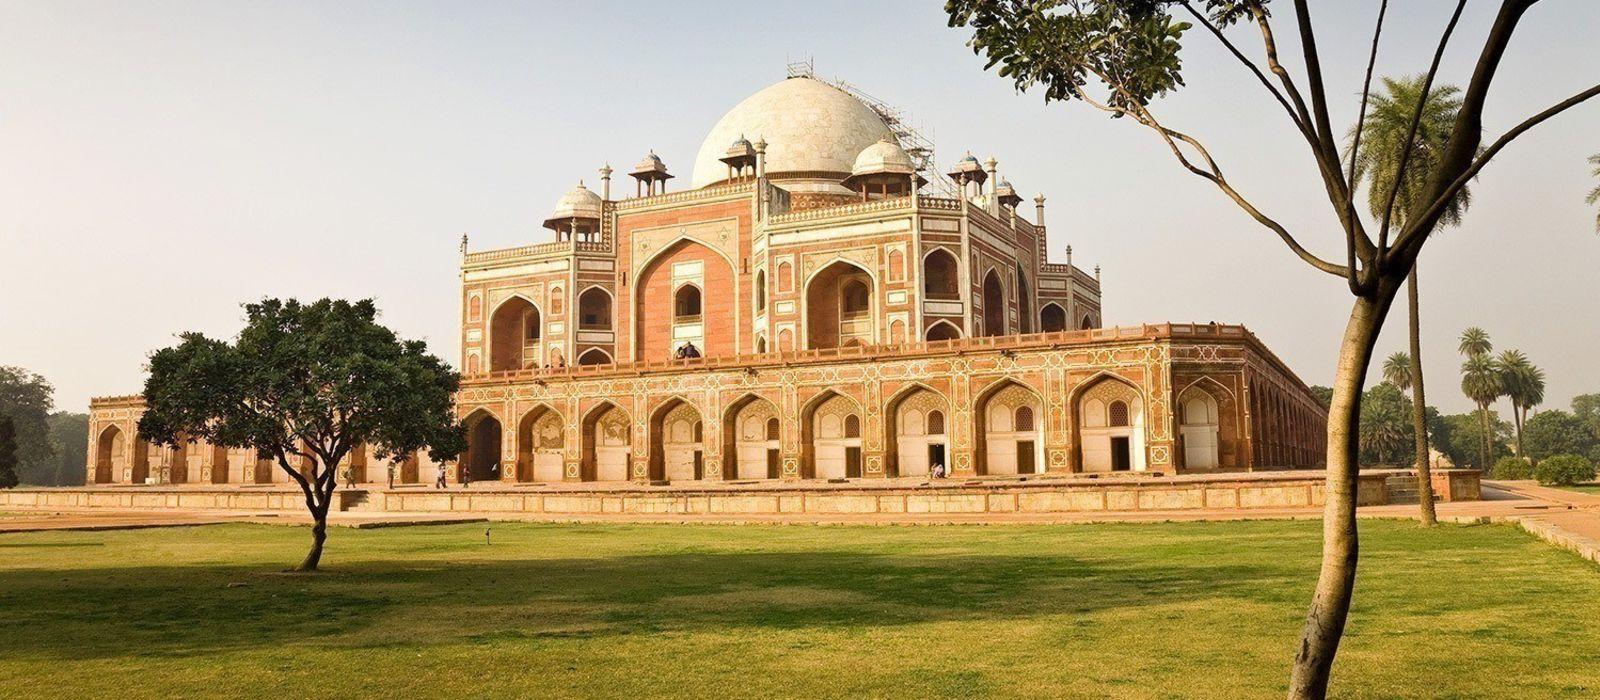 Taj Mahal und Berggipfel: Vom Goldenen Dreieck zum Himalaya Urlaub 1